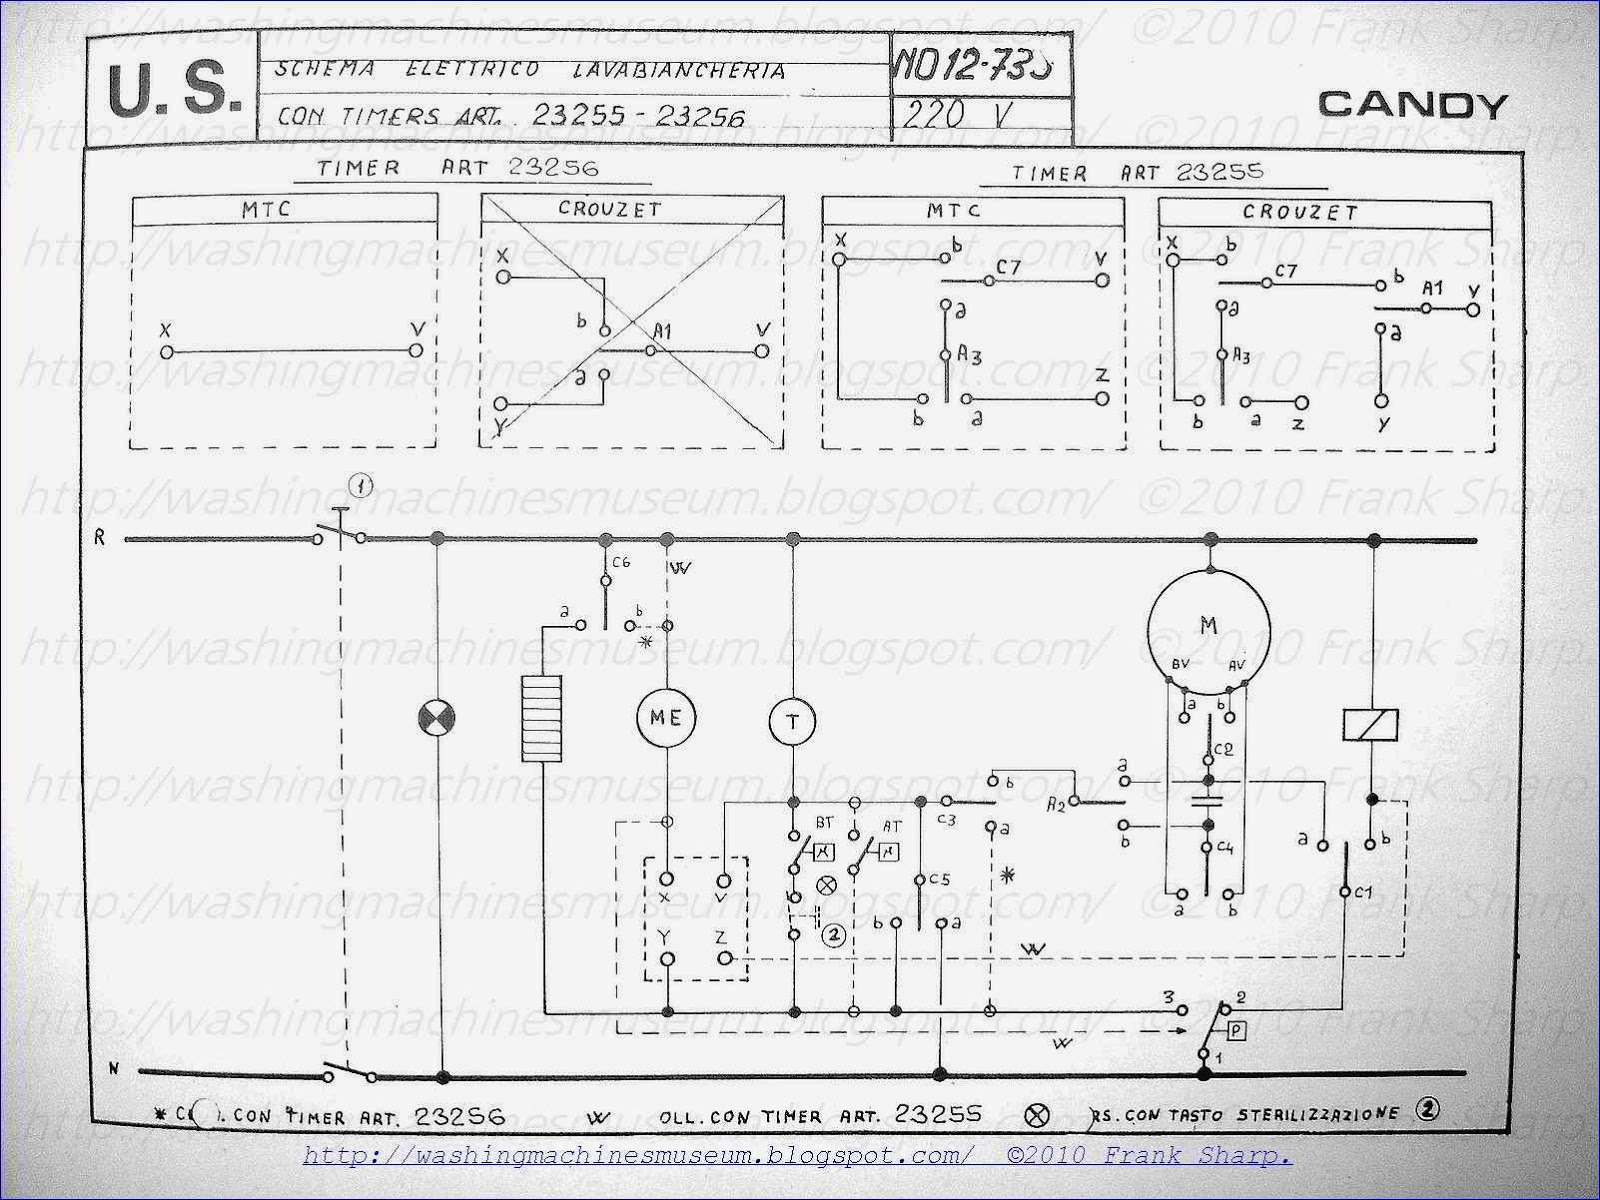 Diagram Dryer Wiring Whirlpool Le6800xp Roper Range 98 Jeep Grand Cherokee Fuse Box Diagramroper Plug Circuit